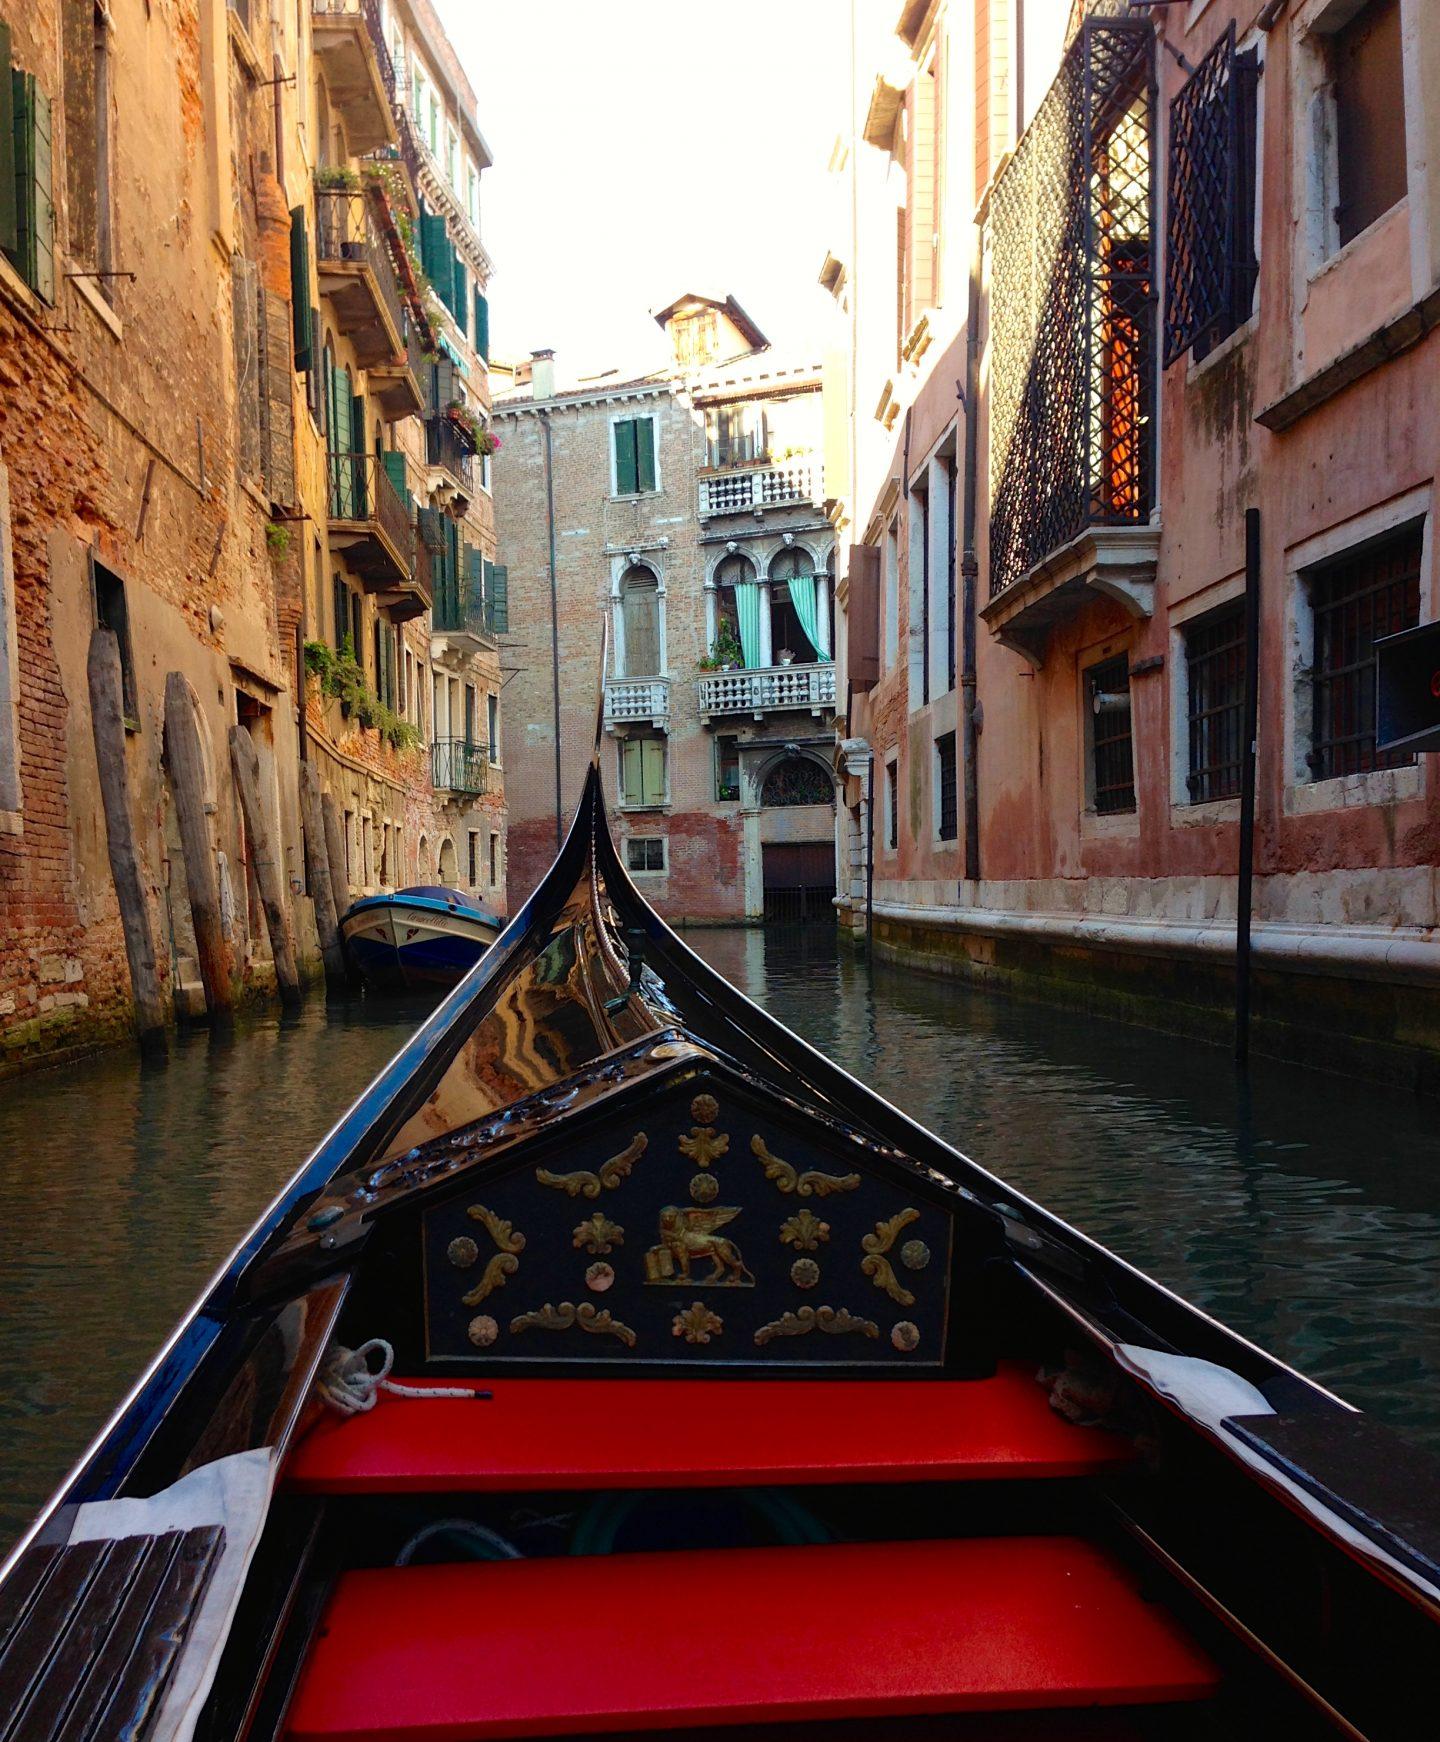 Gondola ride in Venice Italy.